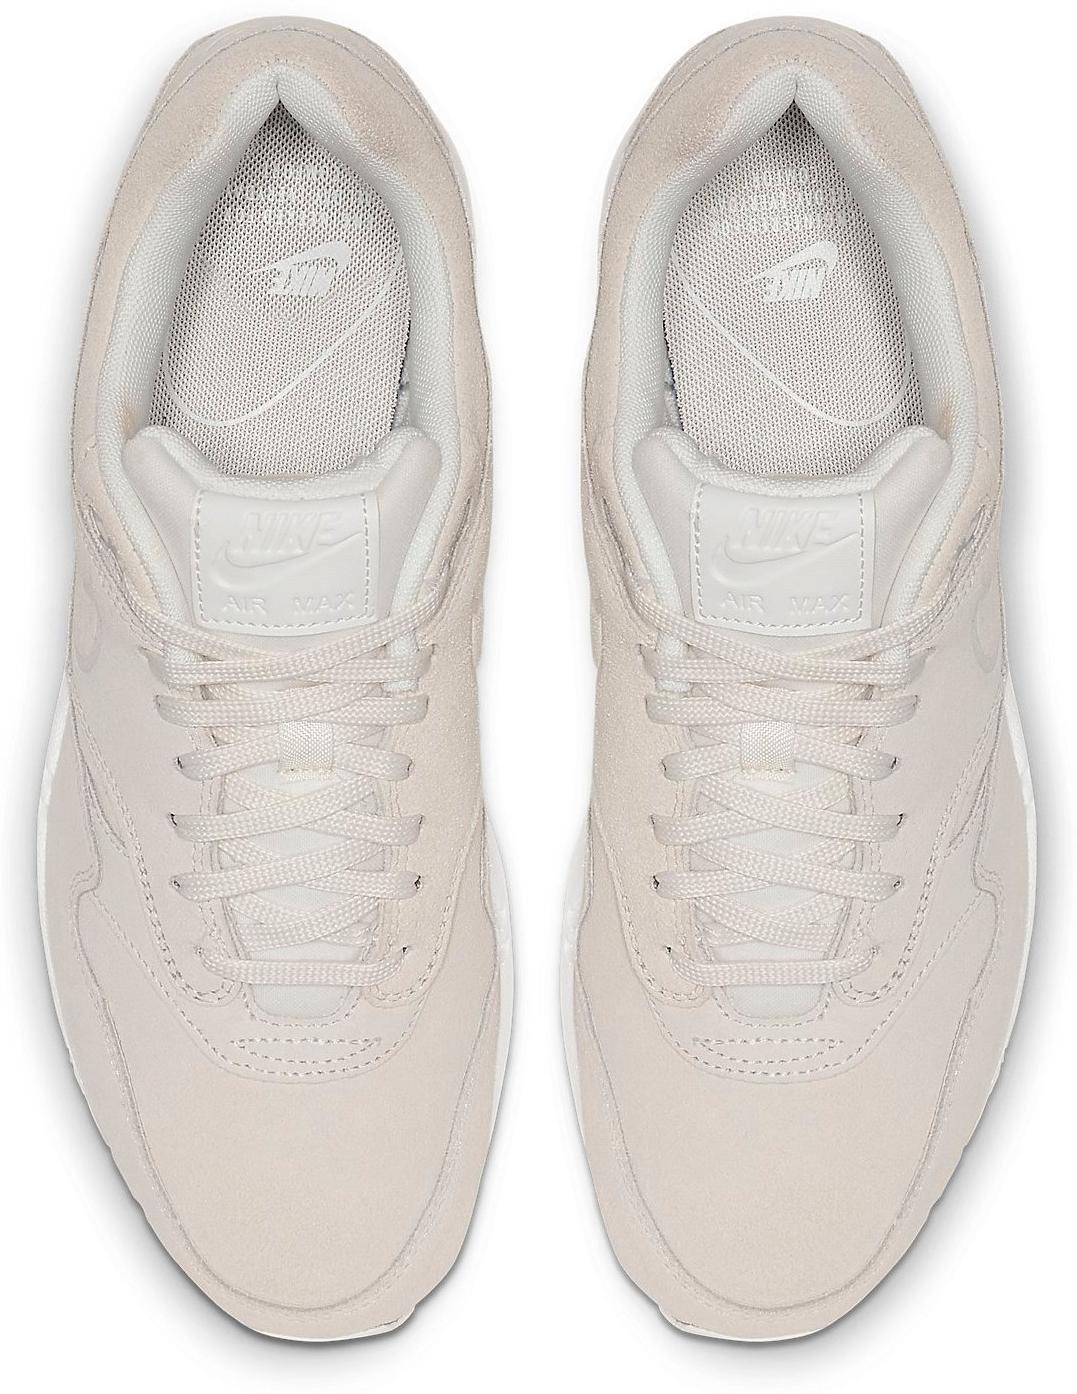 Shoes Nike WMNS AIR MAX 1 PRM